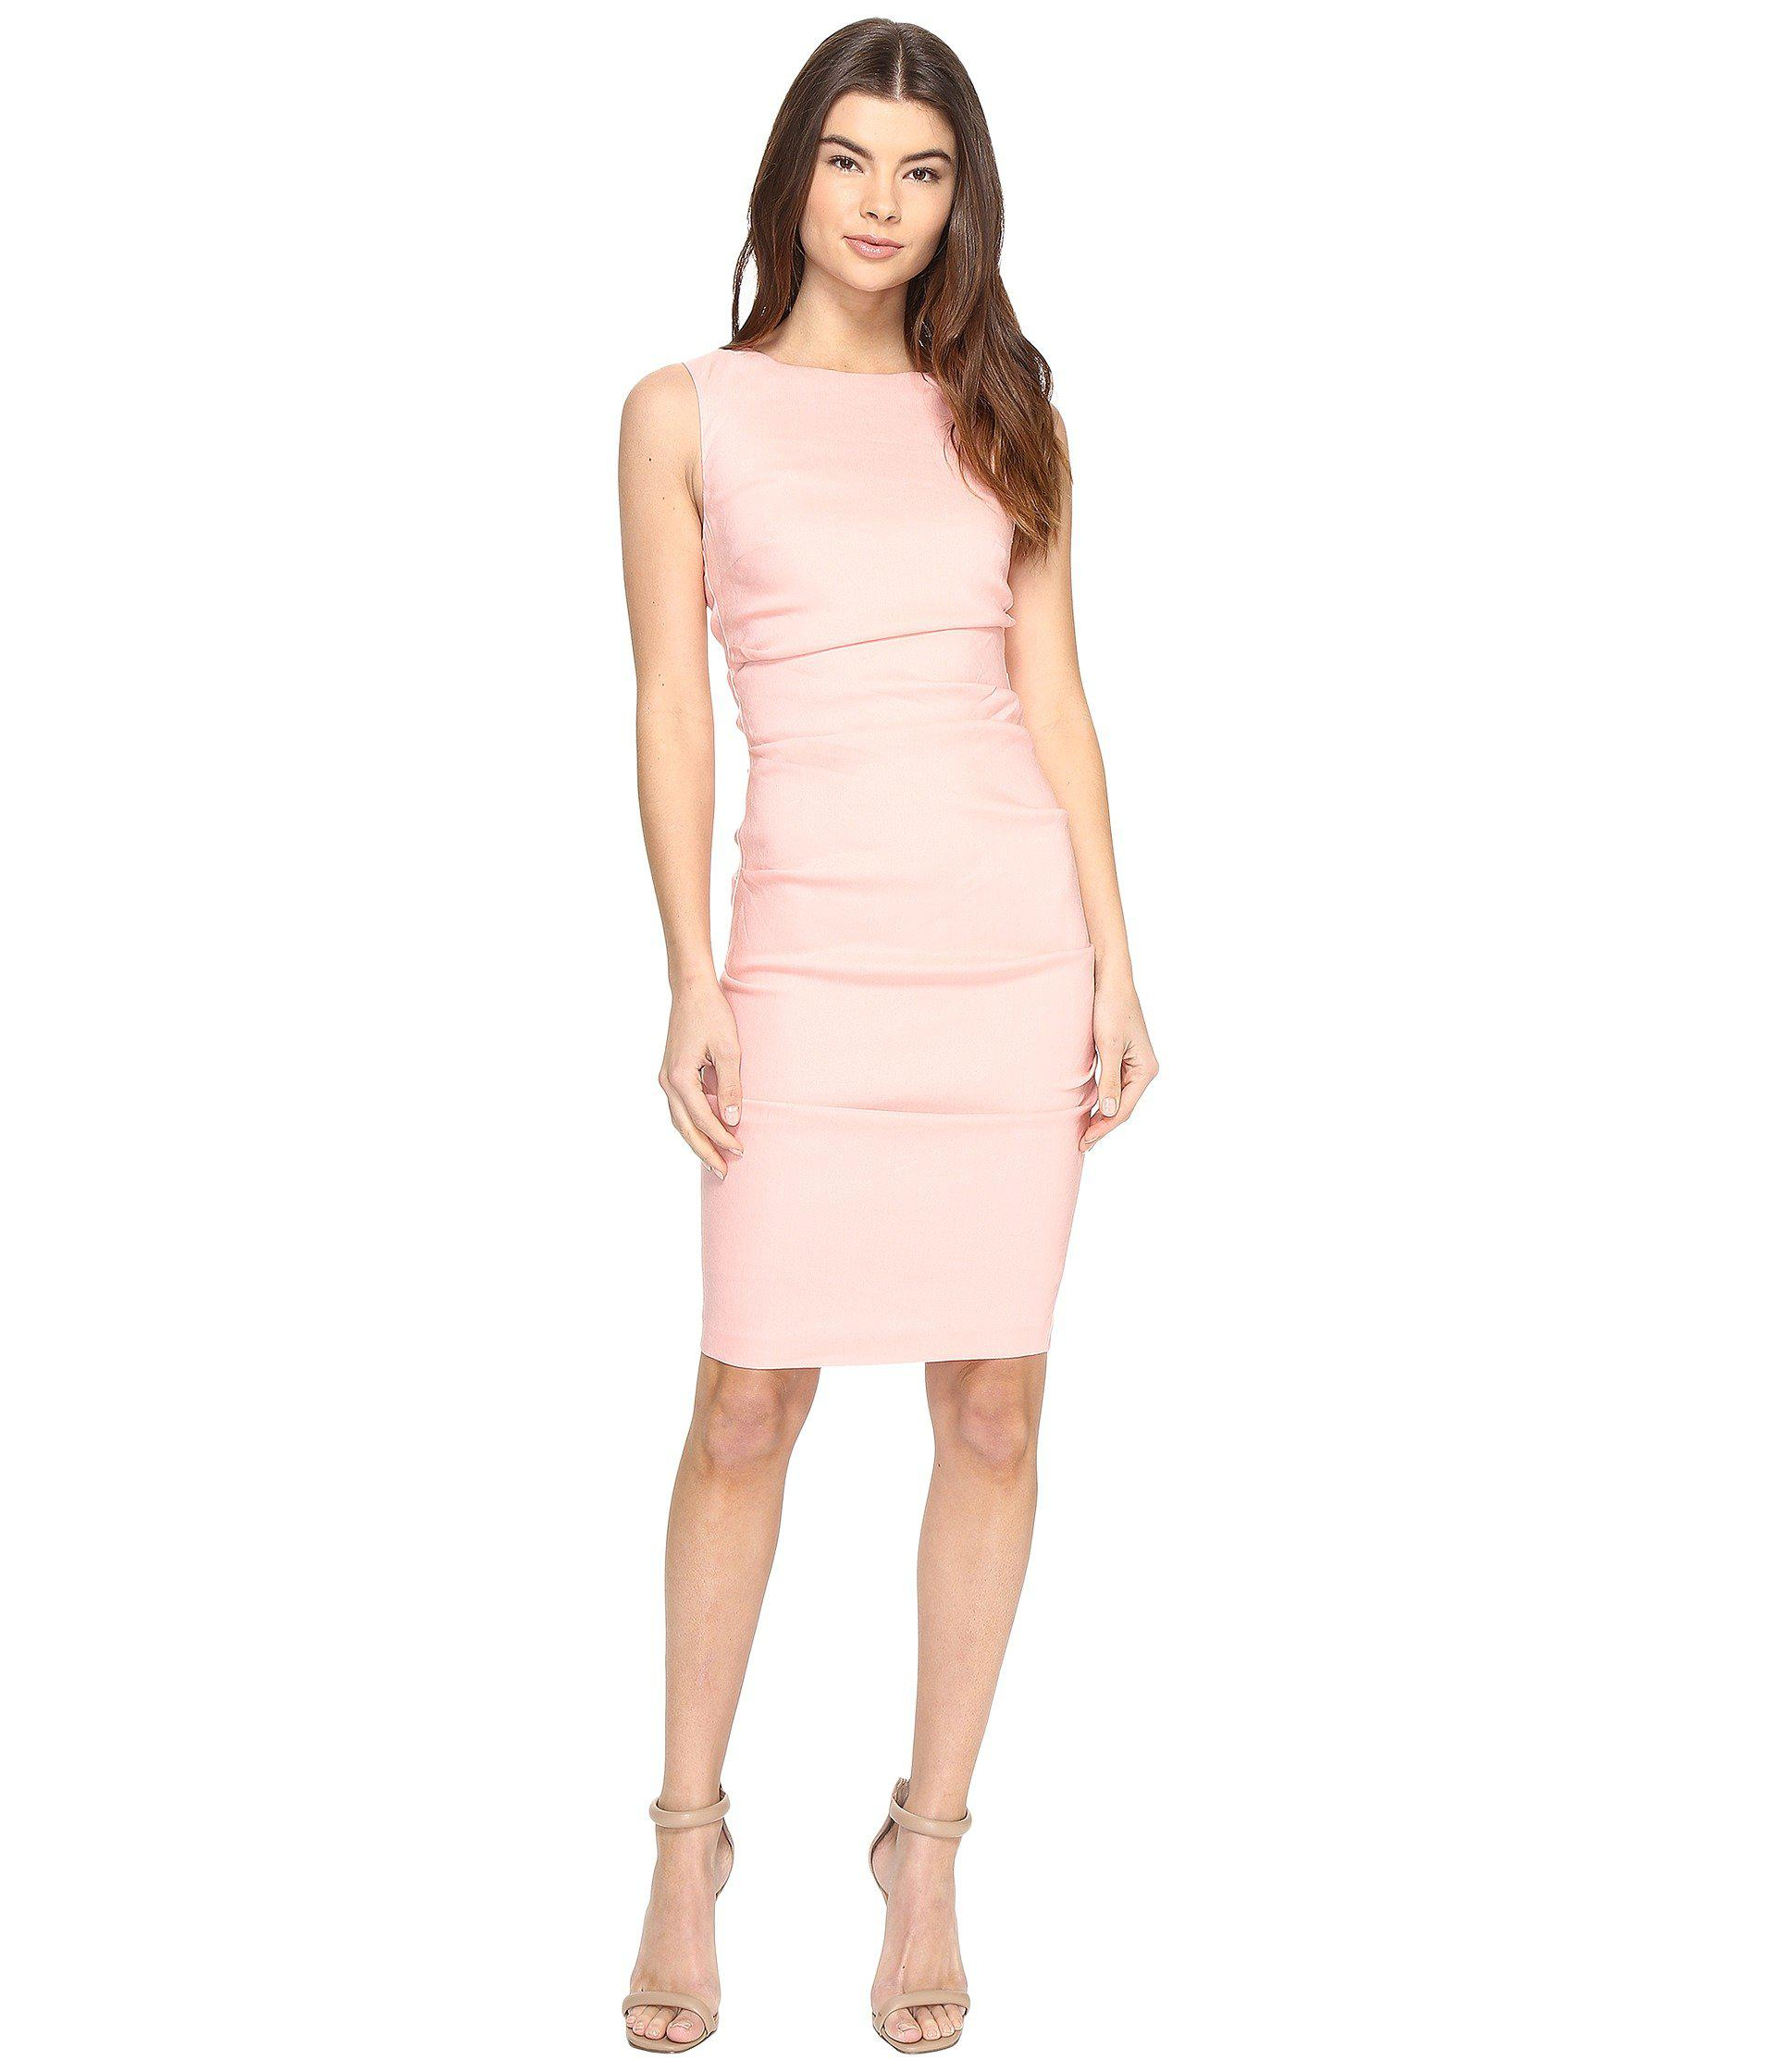 61fe43e749 Lyst - Nicole Miller Lauren Stretch Linen Dress in Pink